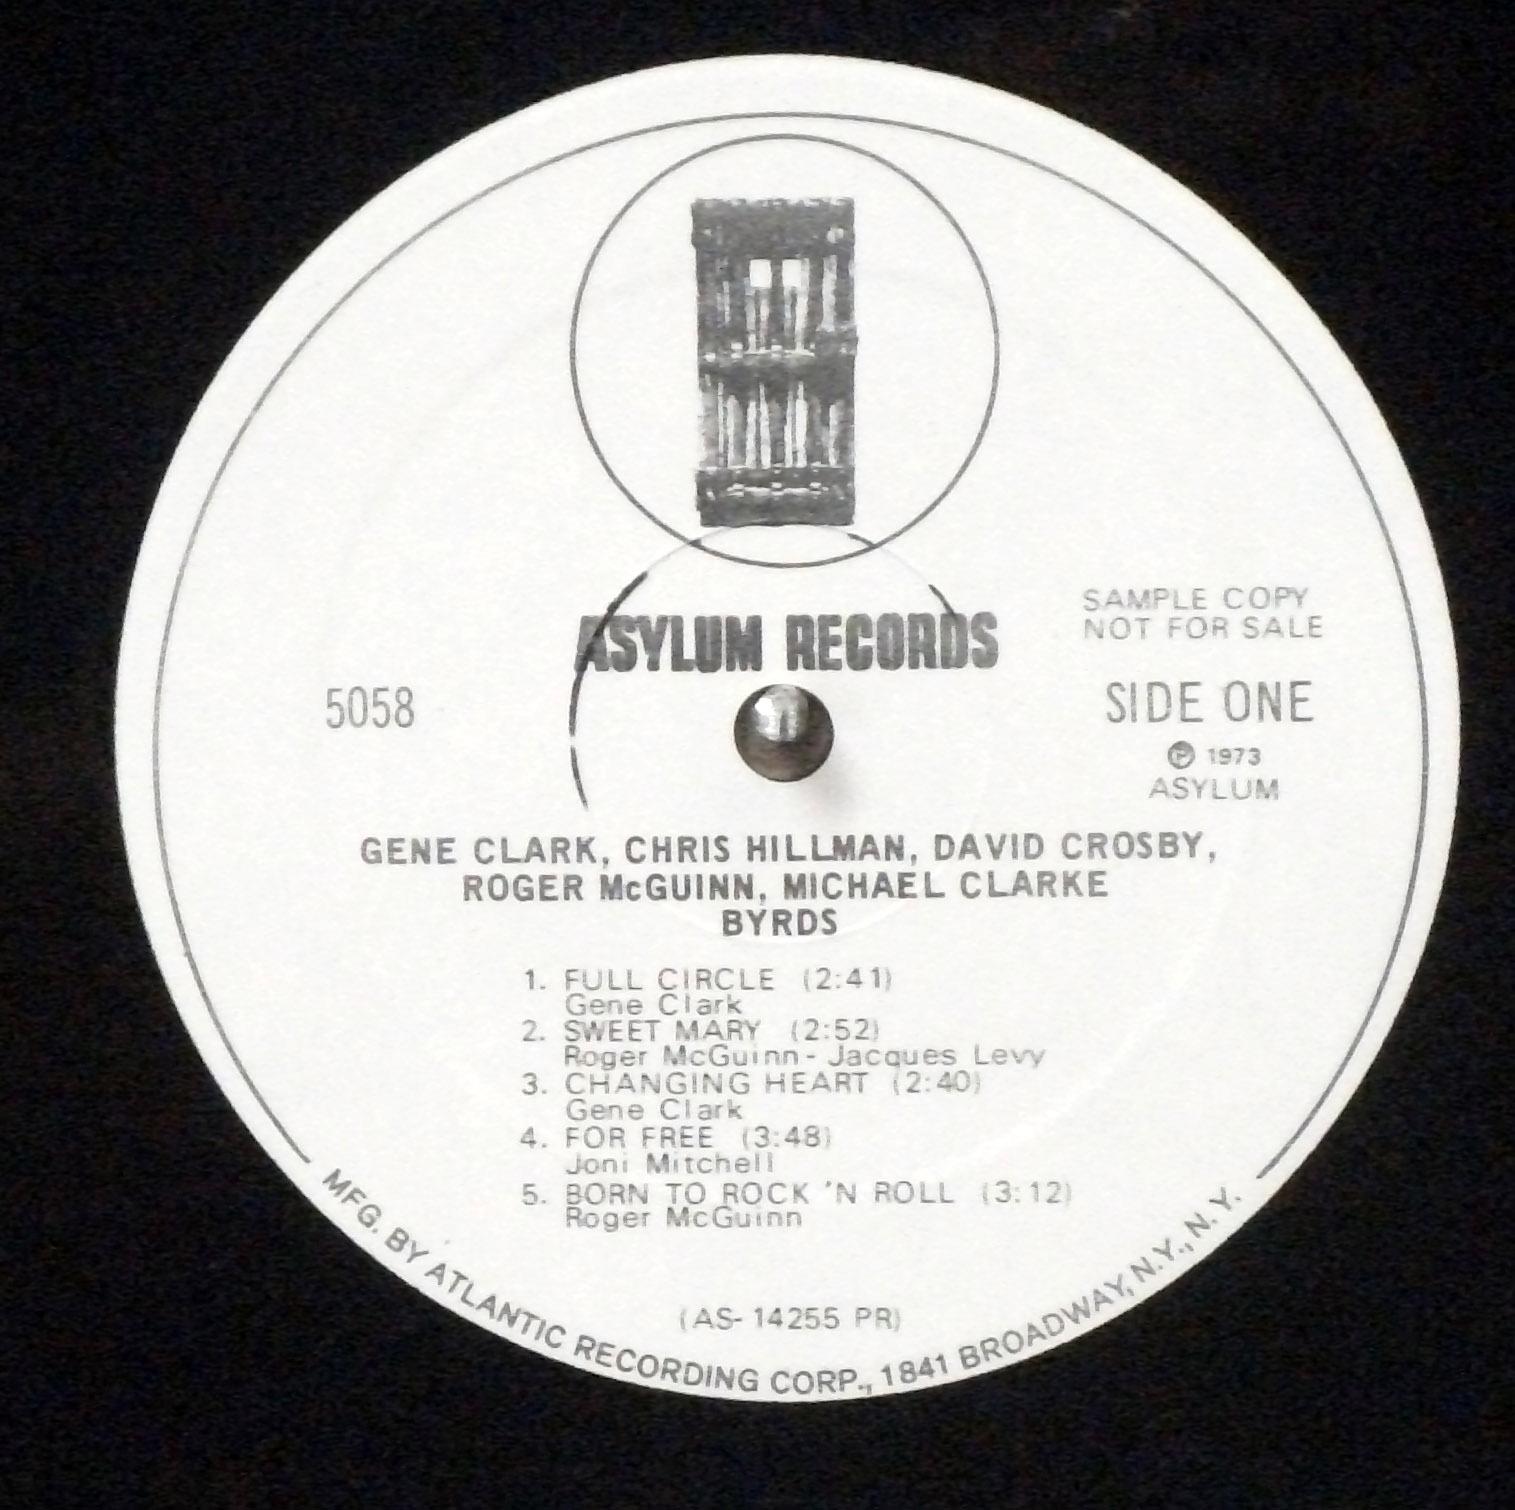 Byrds - self-titled mono white label promo 1973 reunion LP